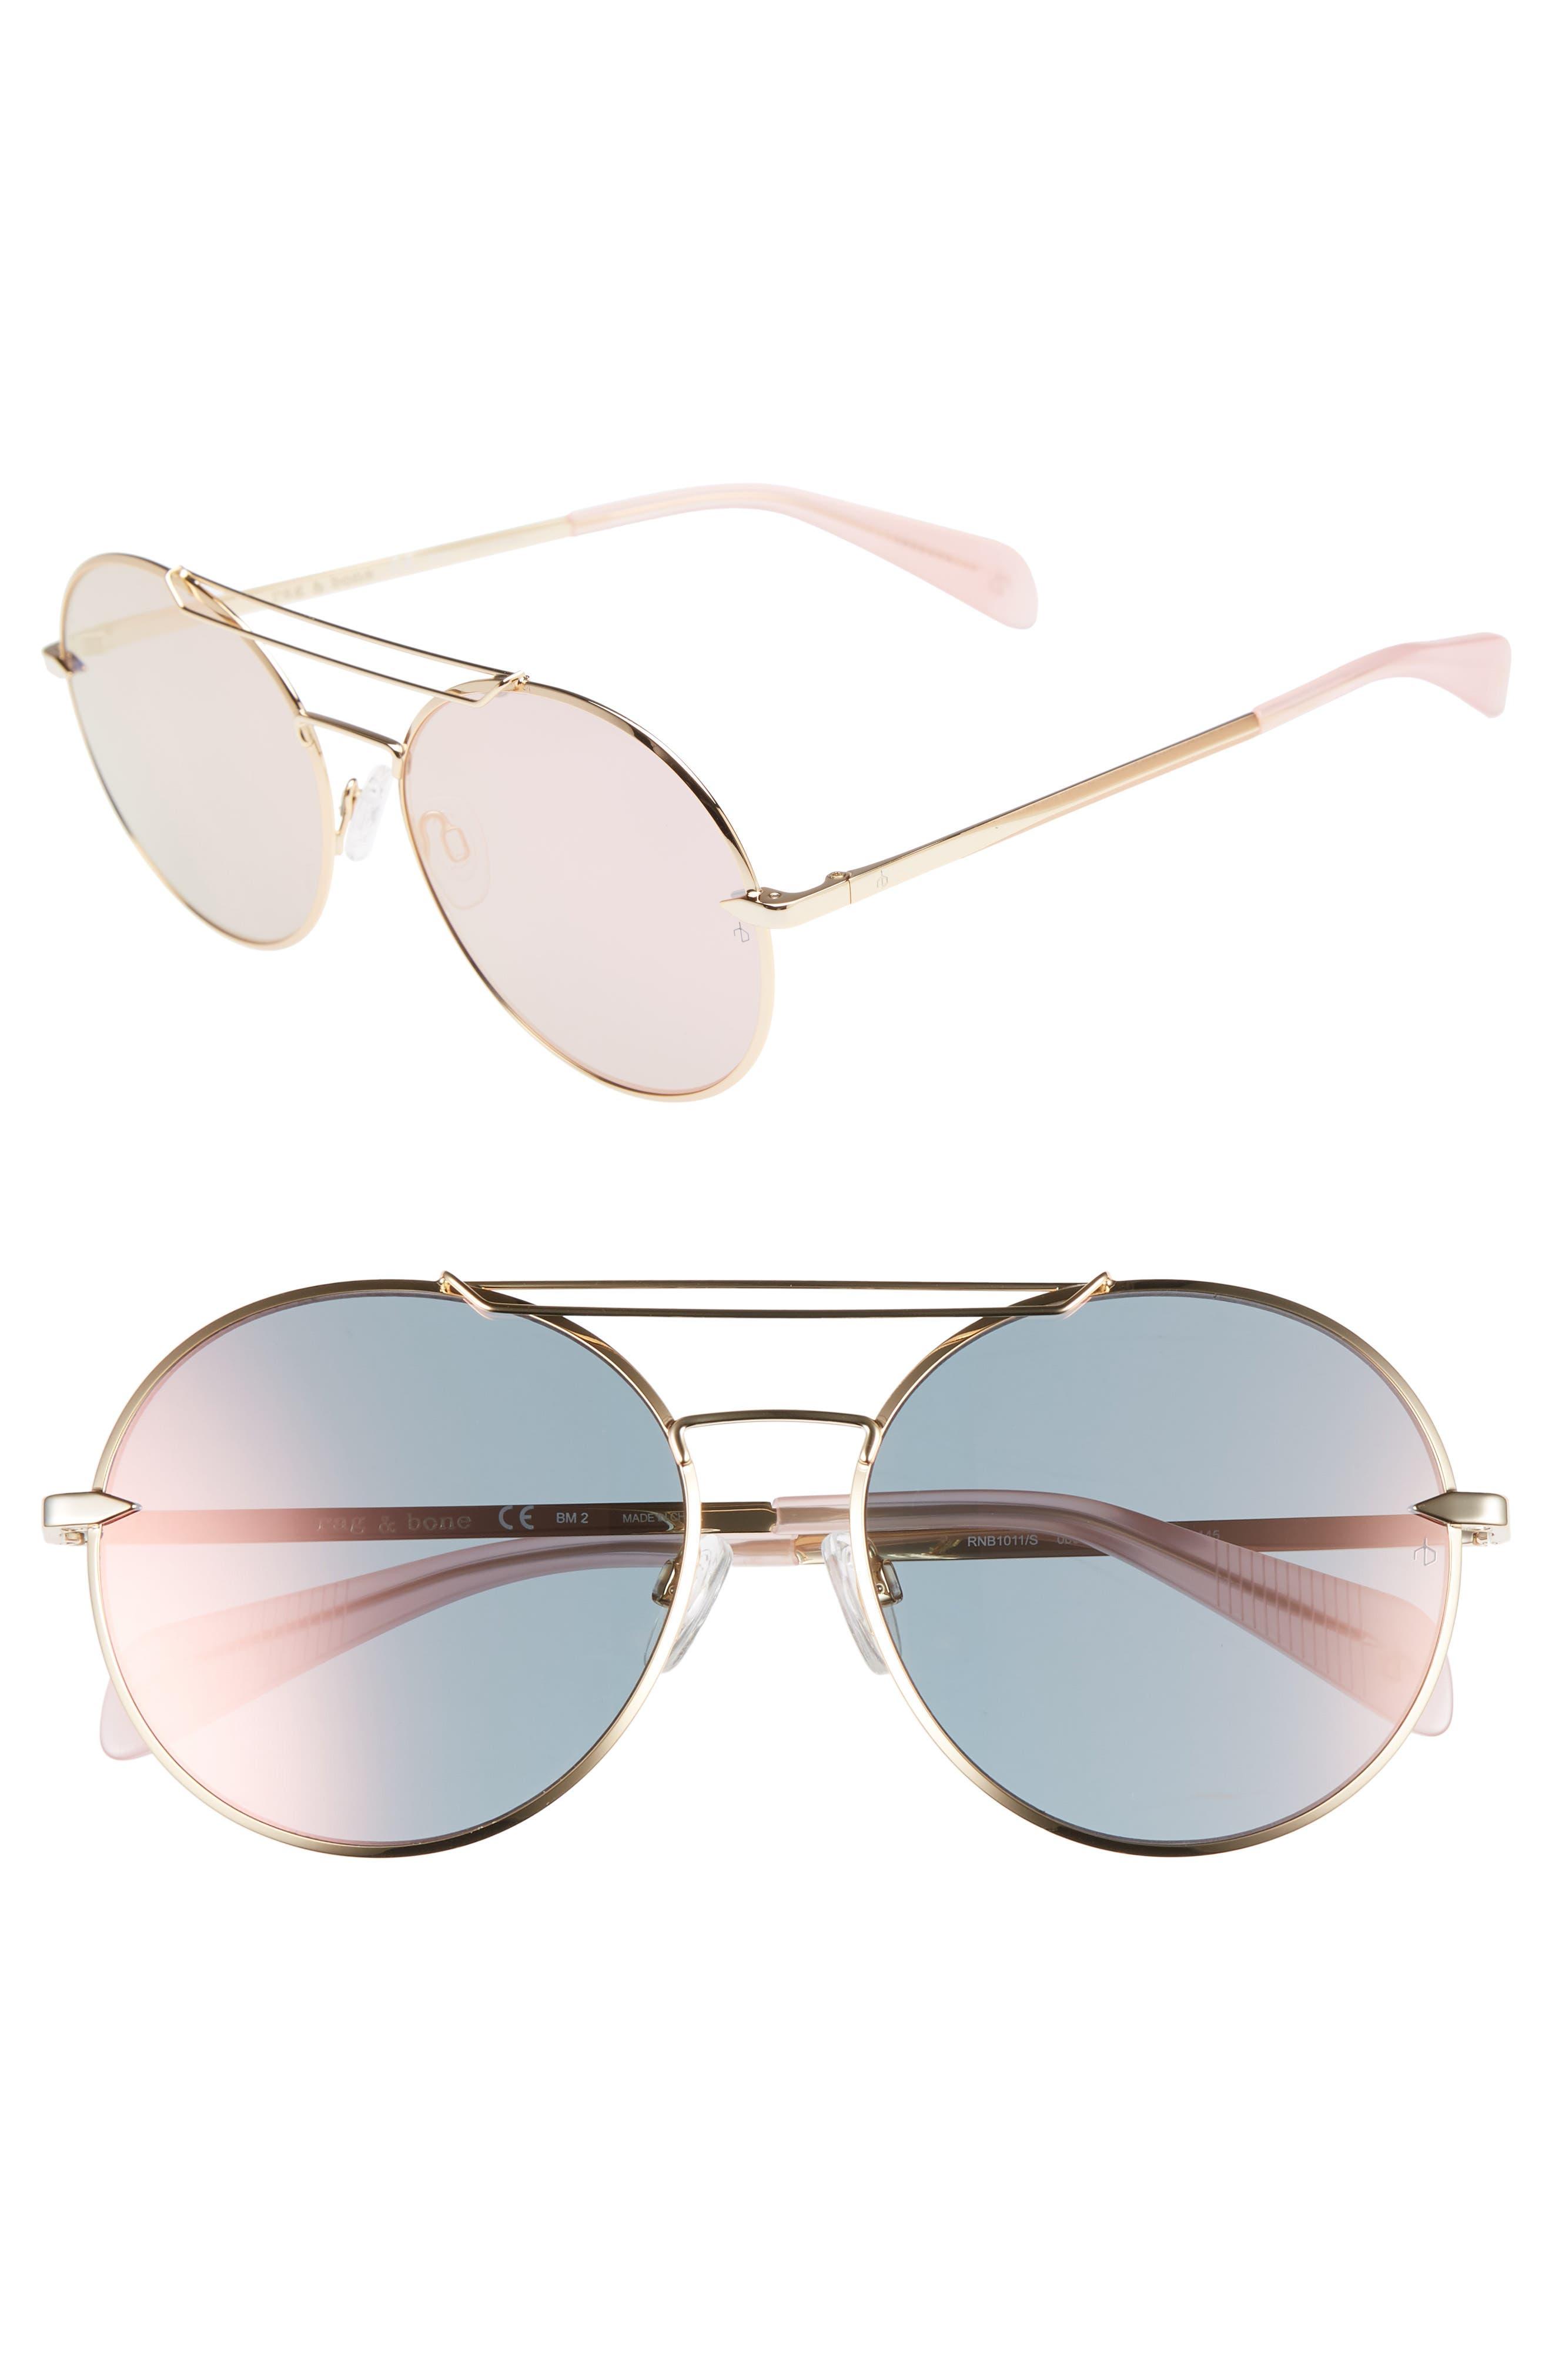 59mm Round Metal Aviator Sunglasses,                         Main,                         color, ROSE GOLD